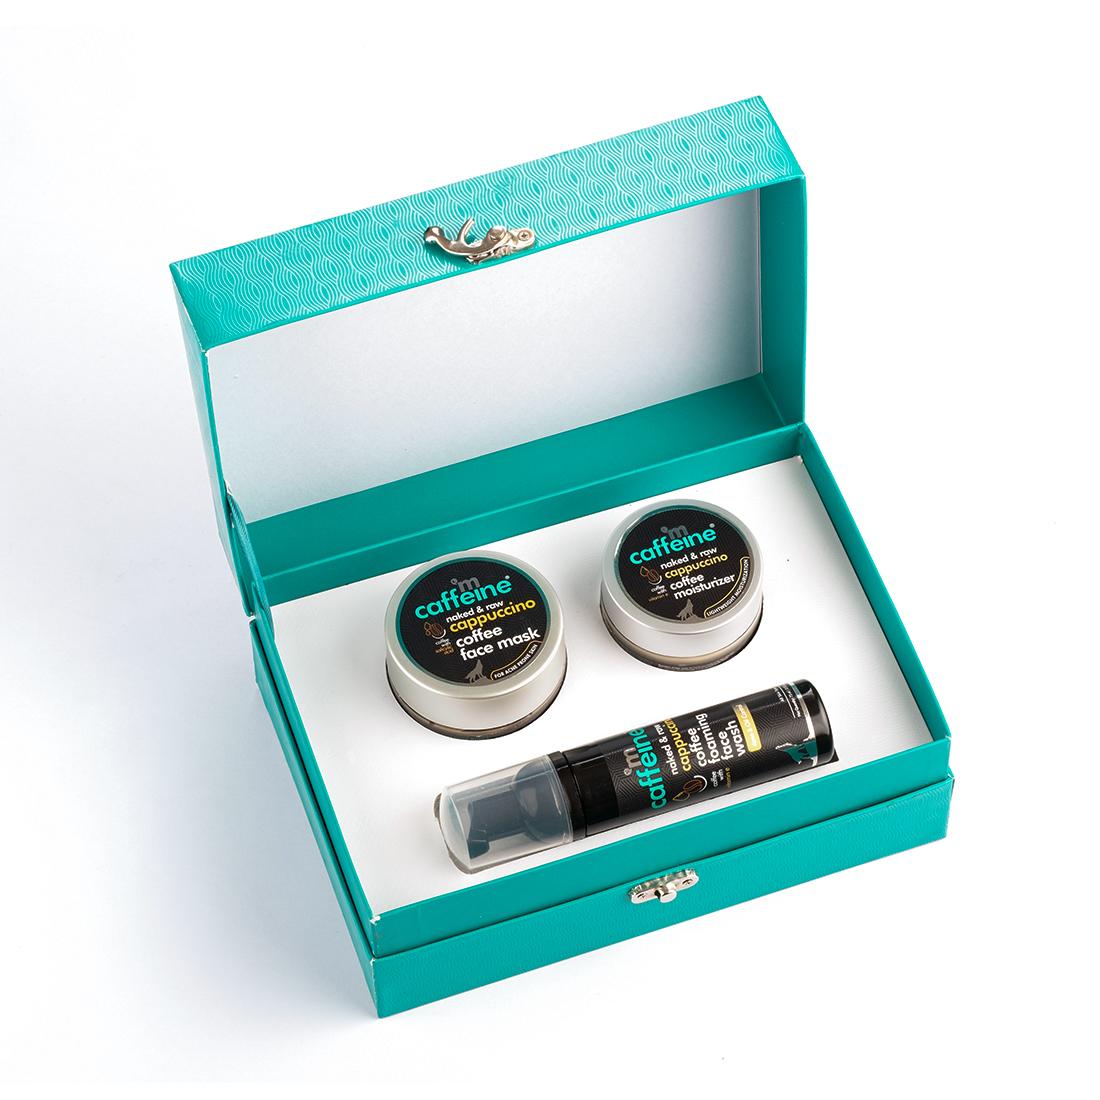 MCaffeine | mCaffeine Balanced Brew - Cappuccino Gift Kit | Face Mask, Face wash, Moisturizer